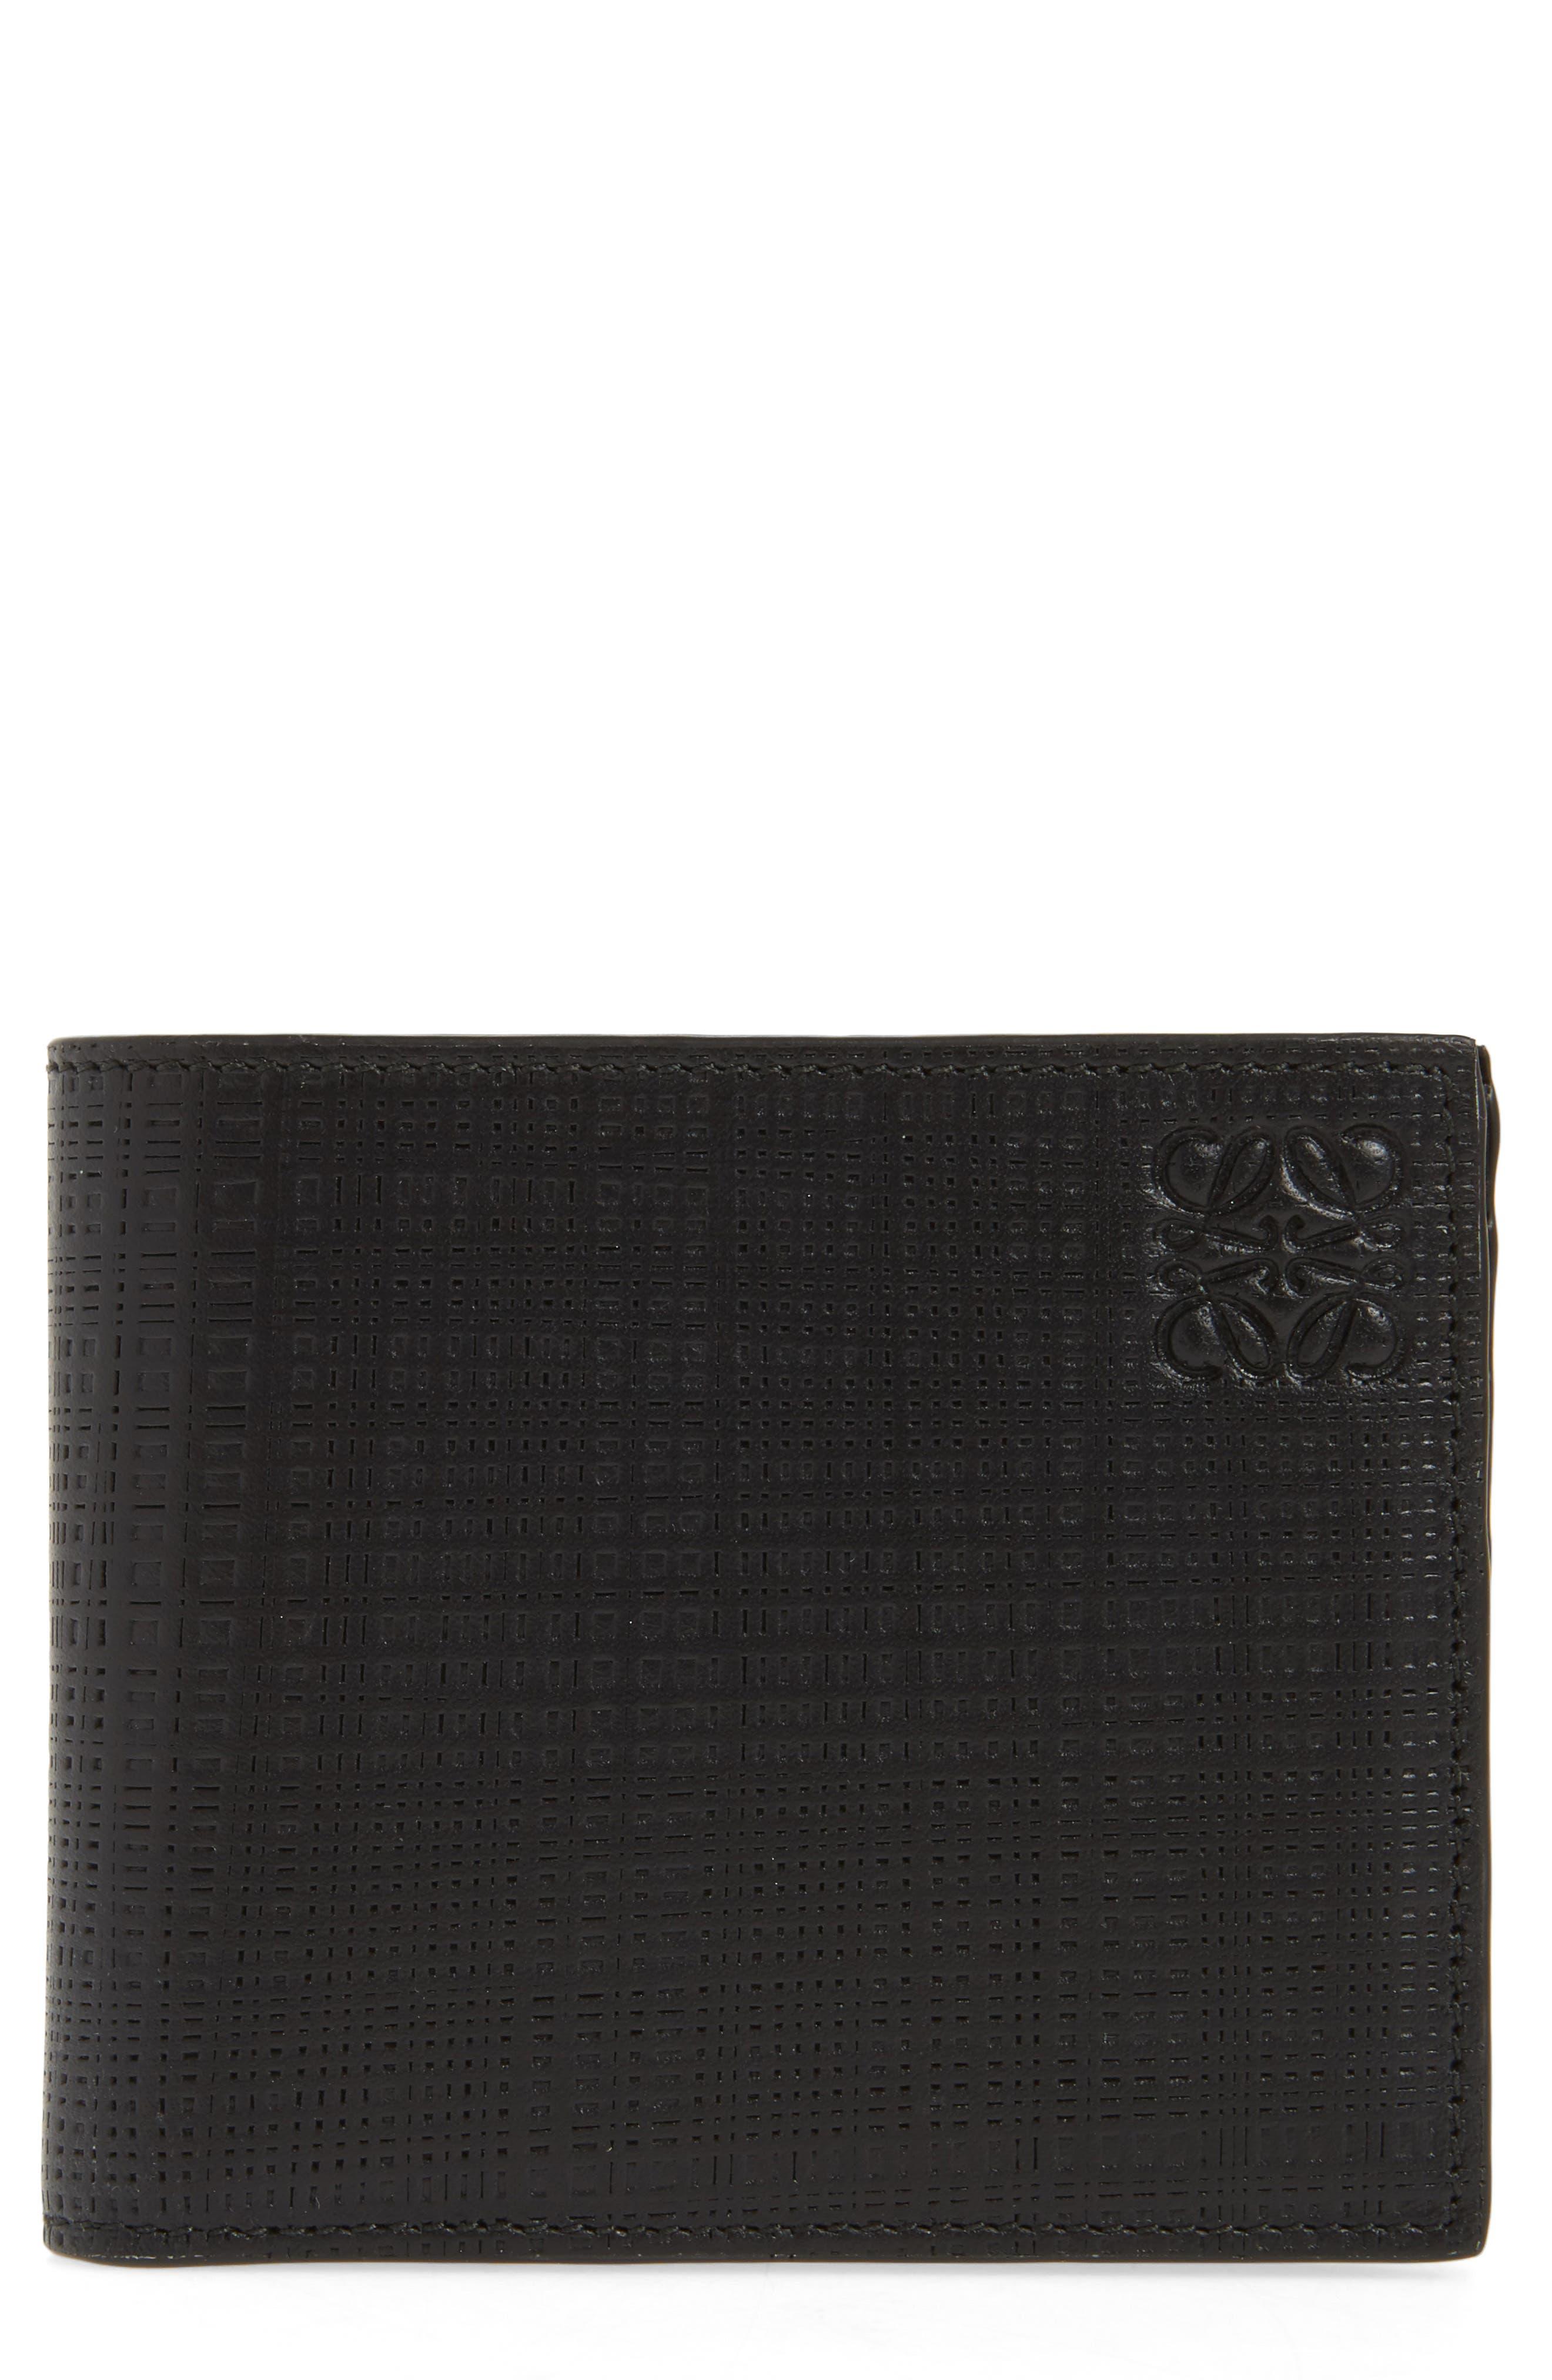 LOEWE, Bifold Leather Wallet, Main thumbnail 1, color, BLACK